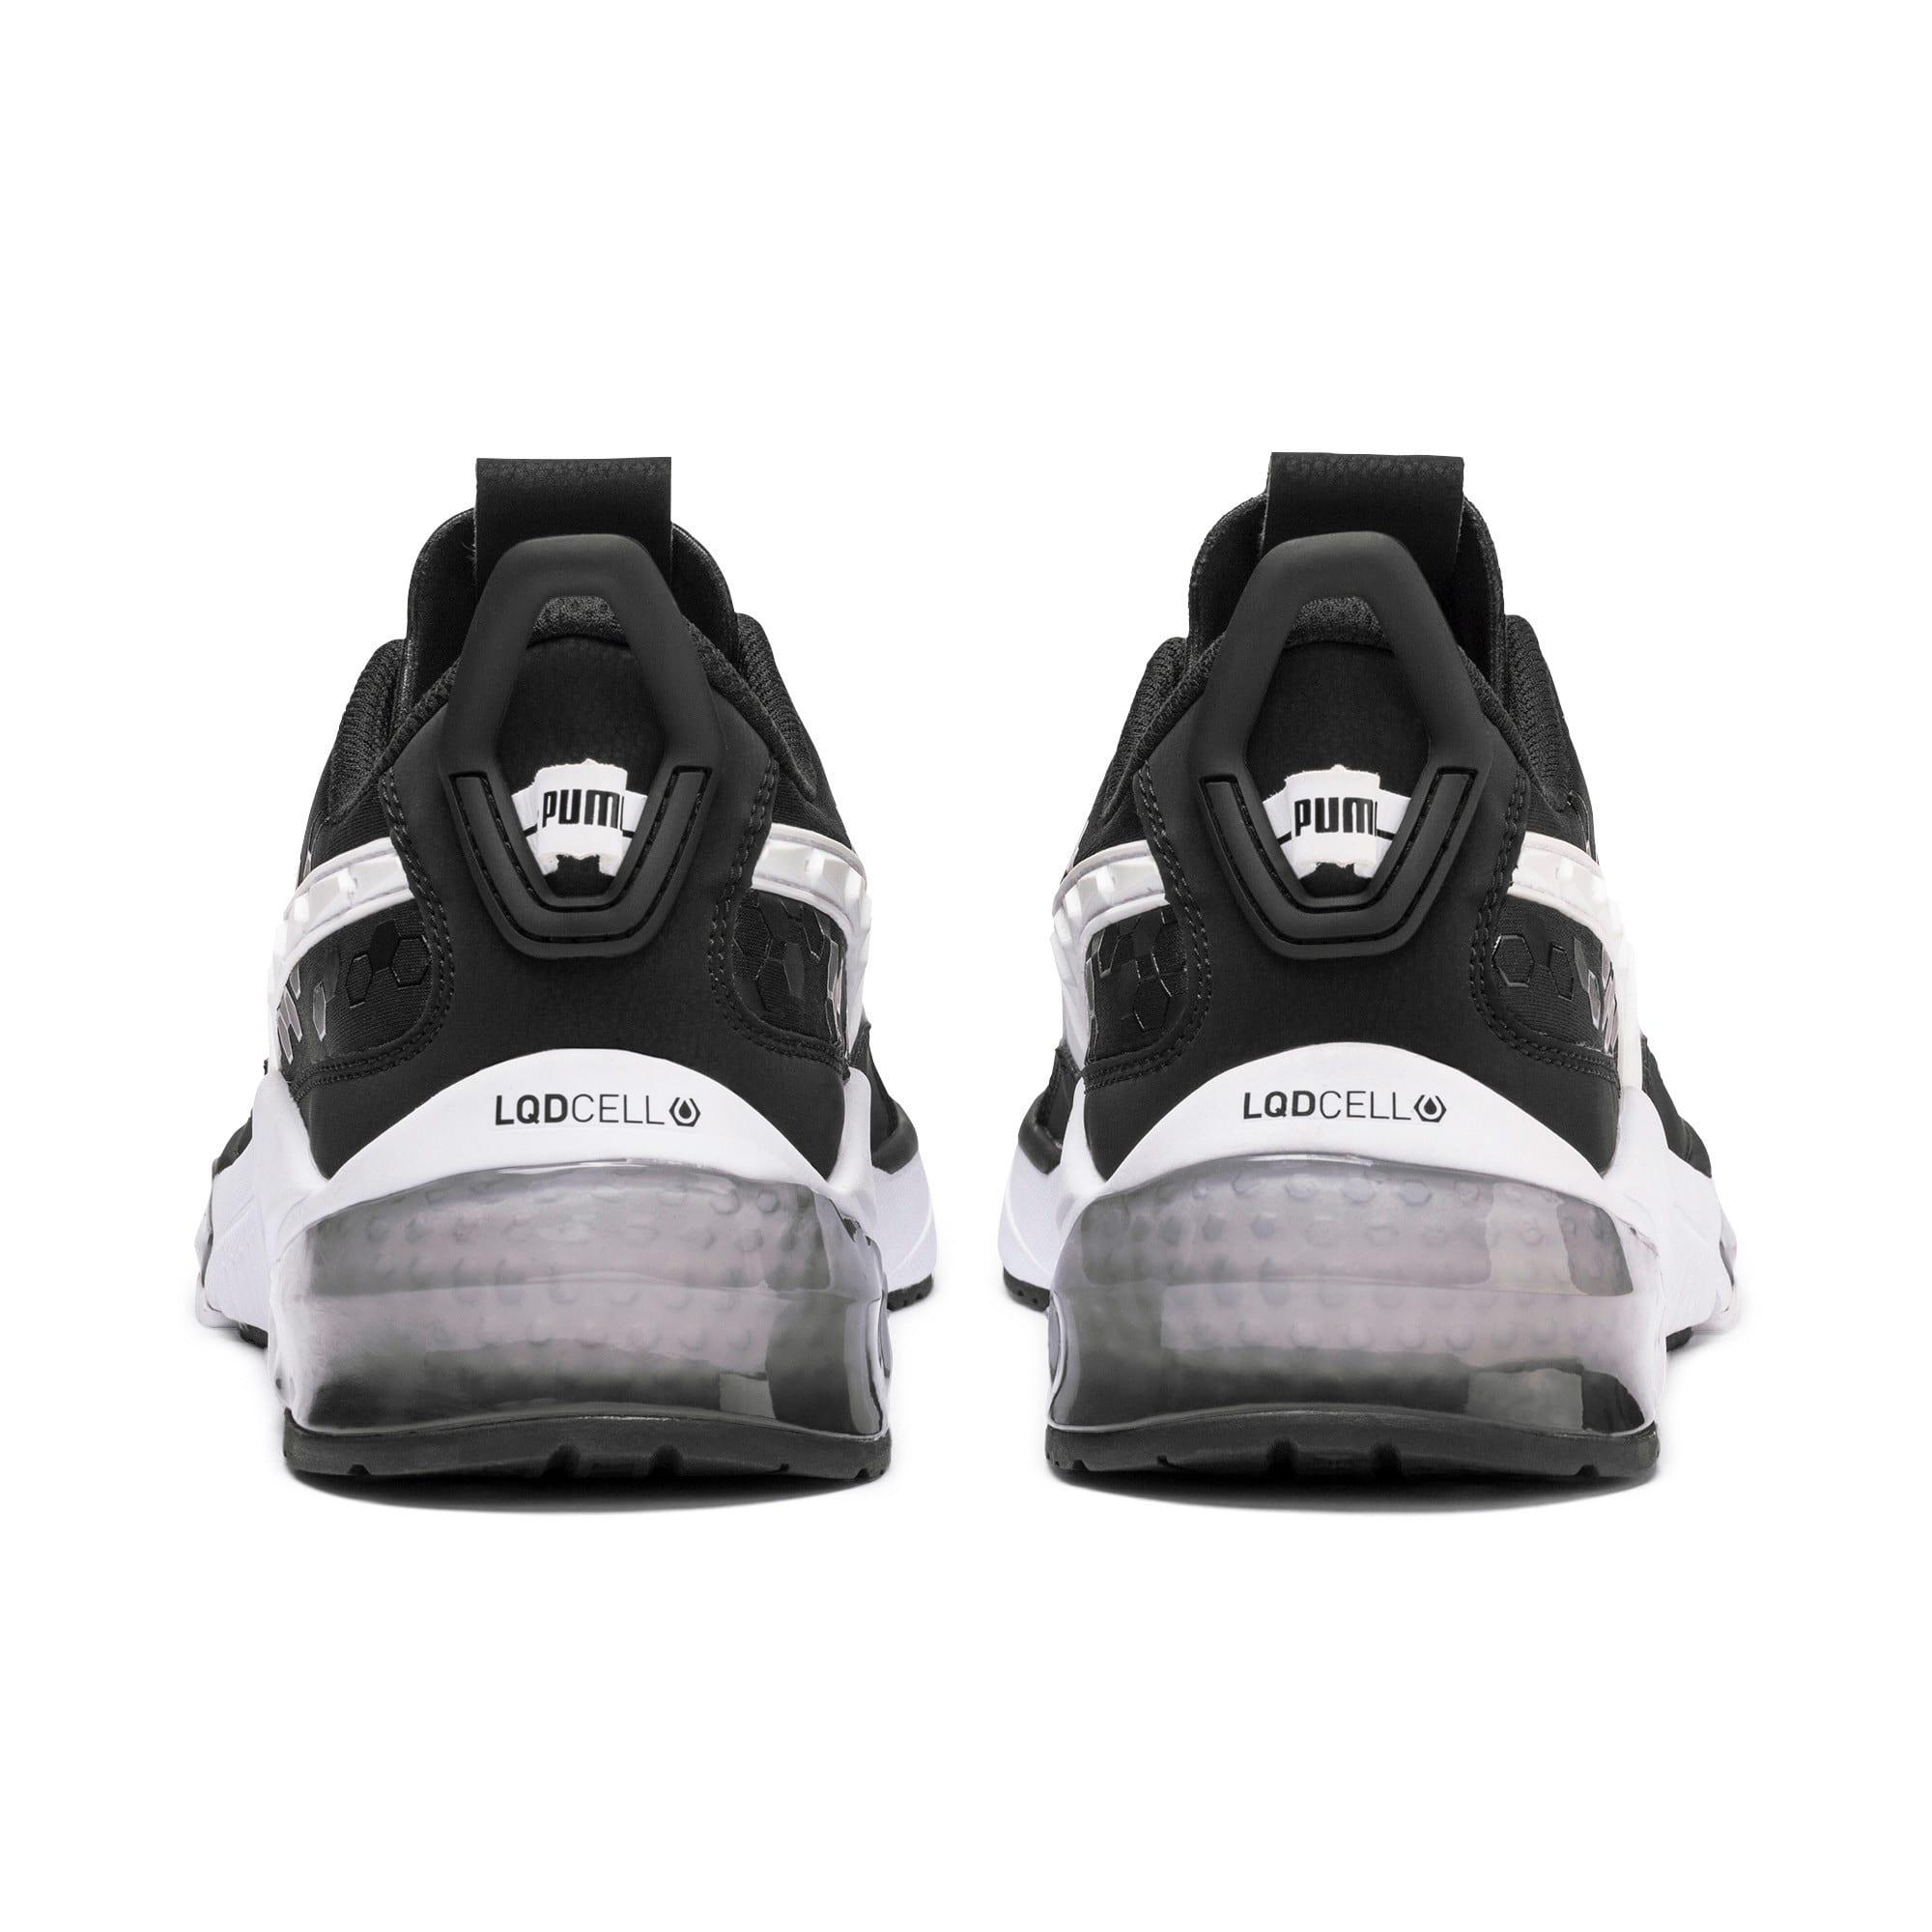 Thumbnail 4 of LQDCELL Optic Training Shoes, Puma Black-Puma White, medium